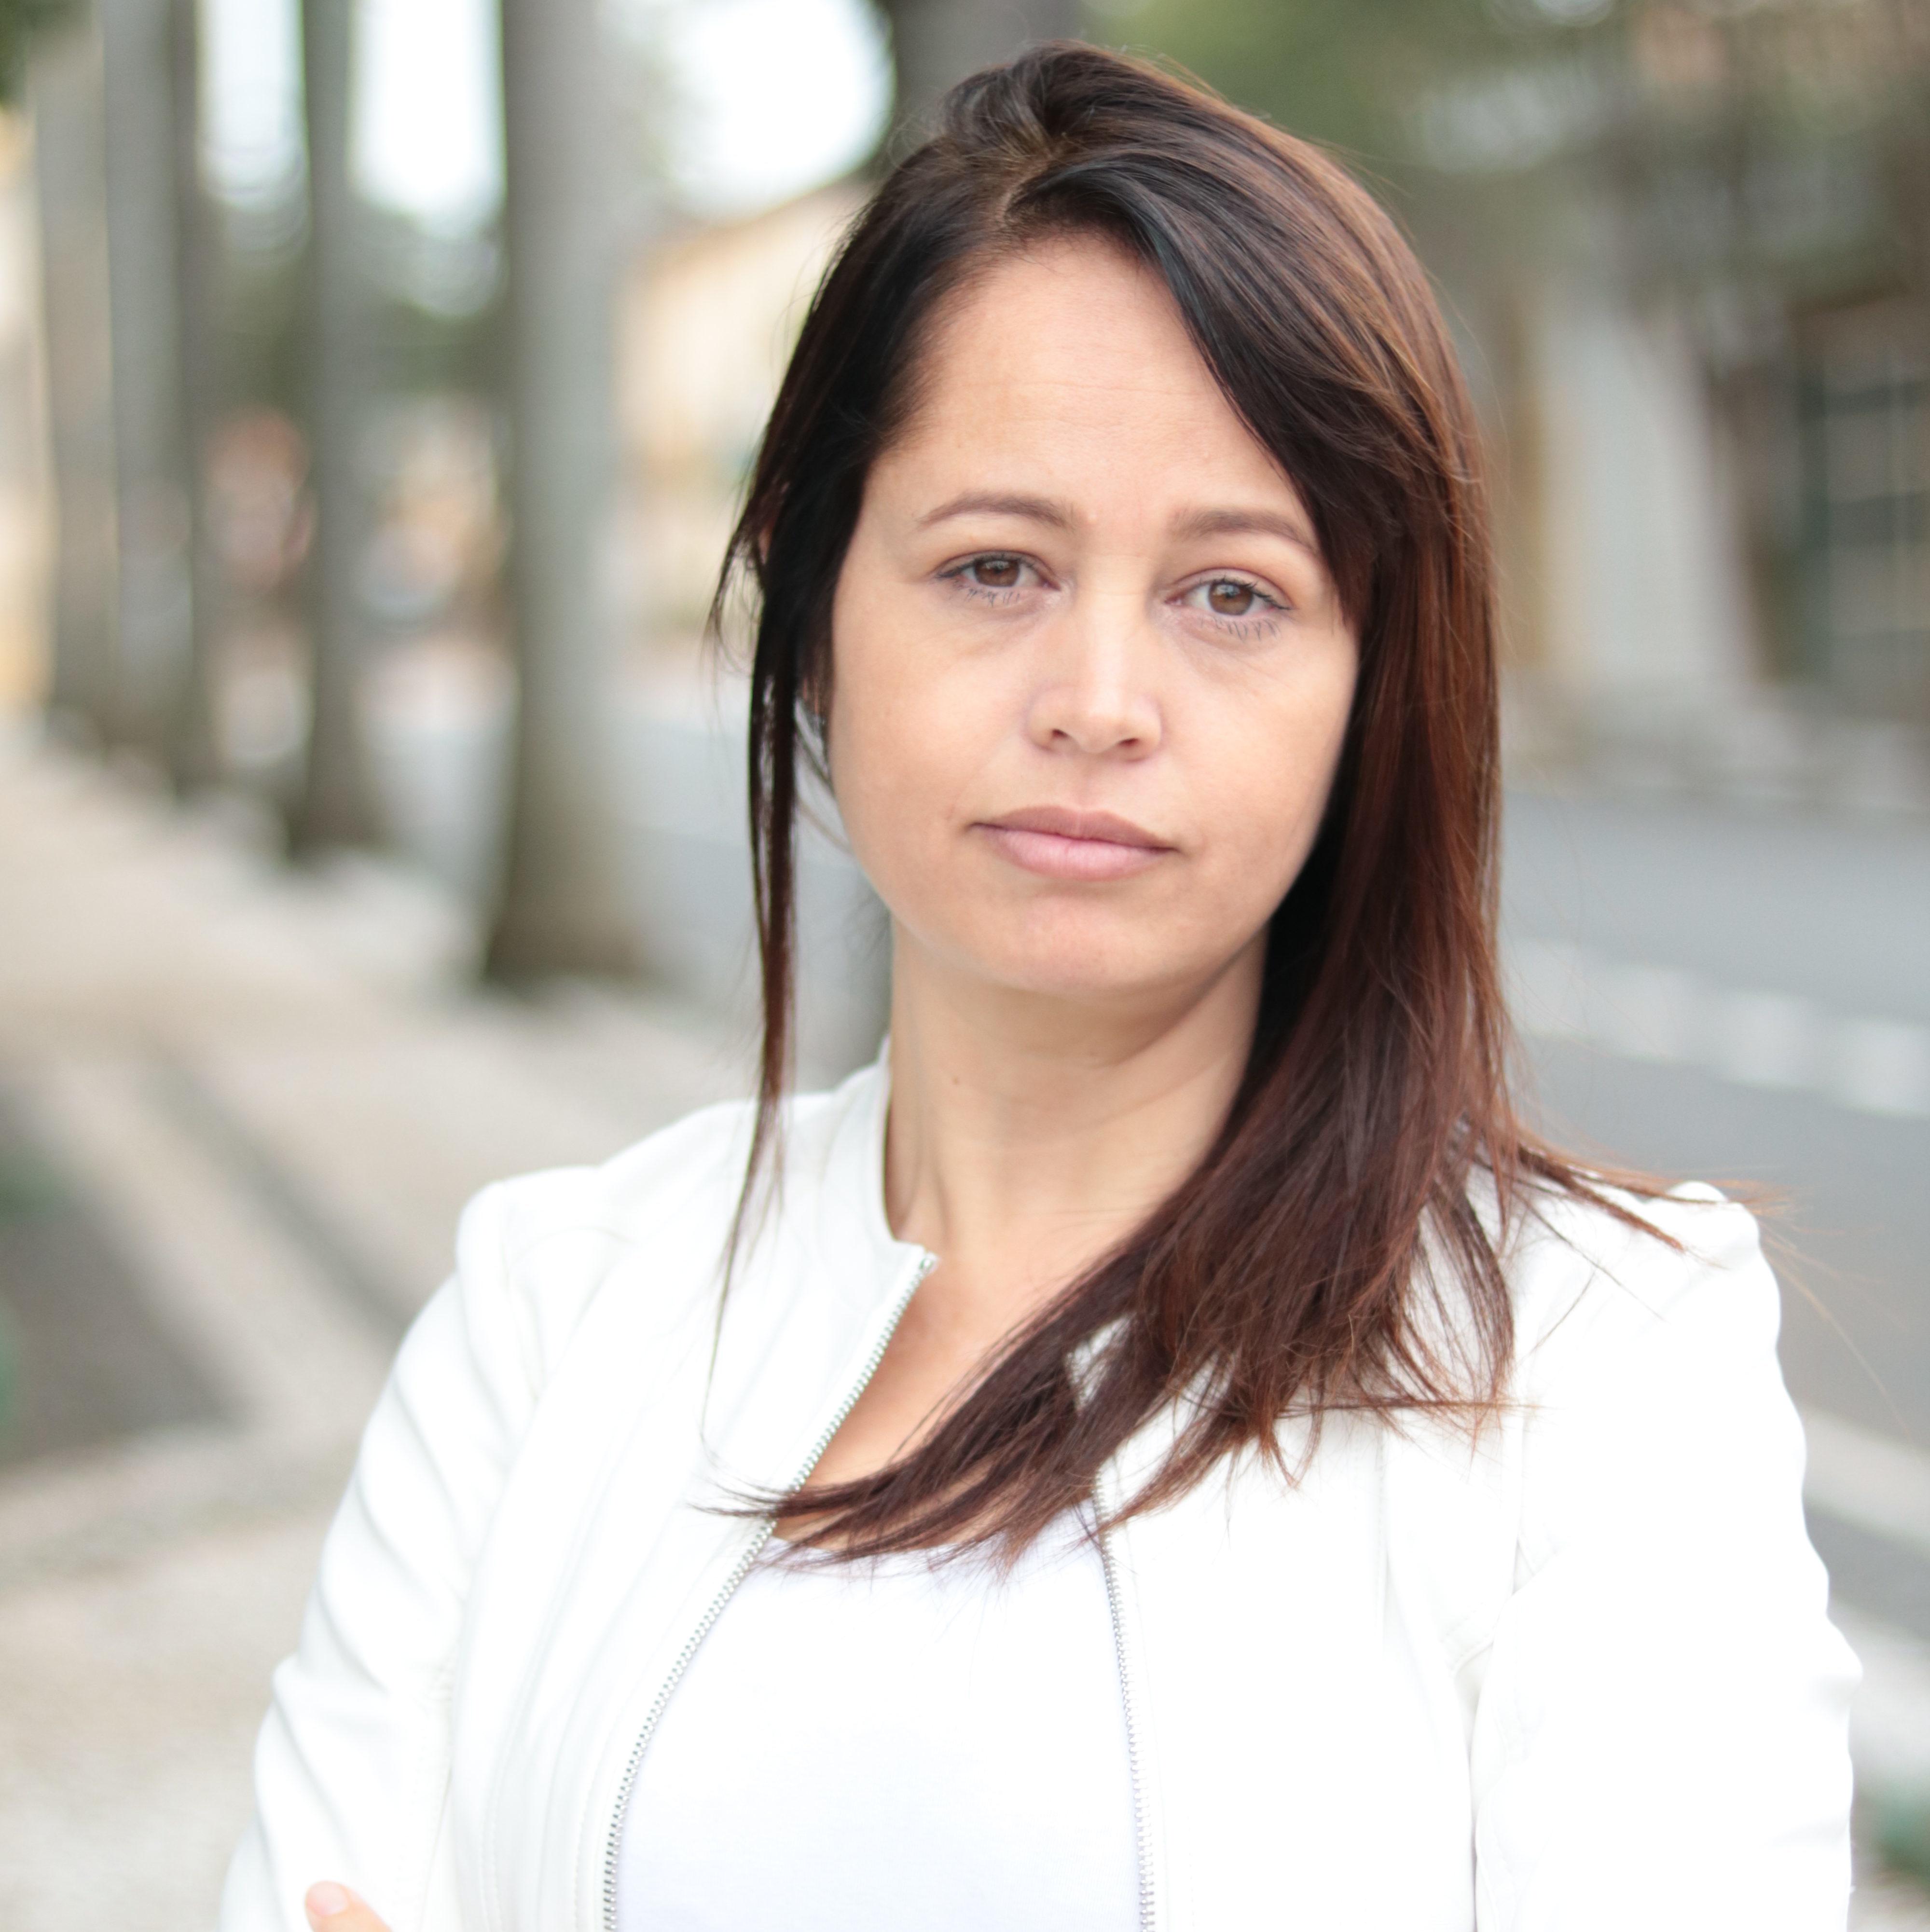 Andréa Souza